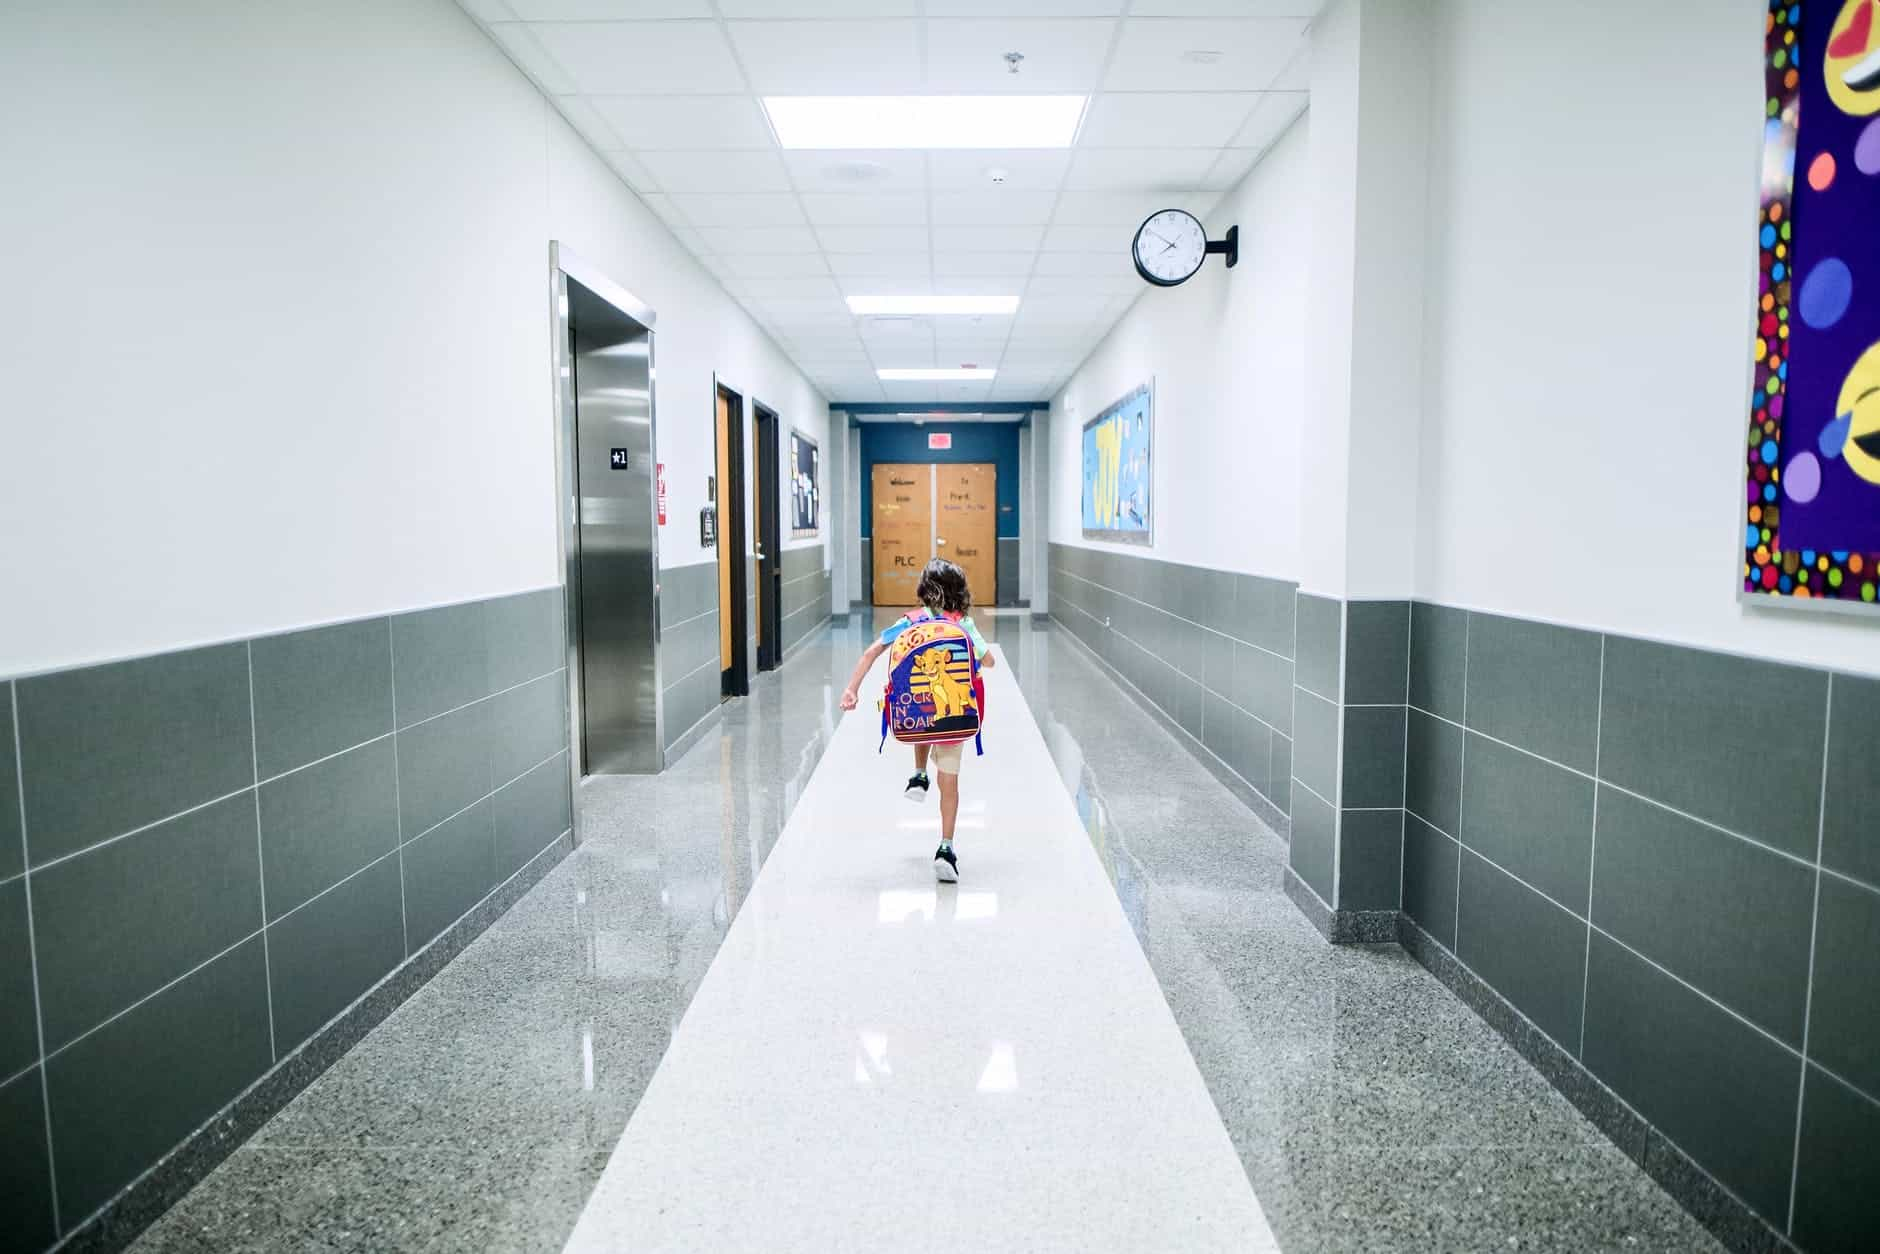 boy running in the hallway